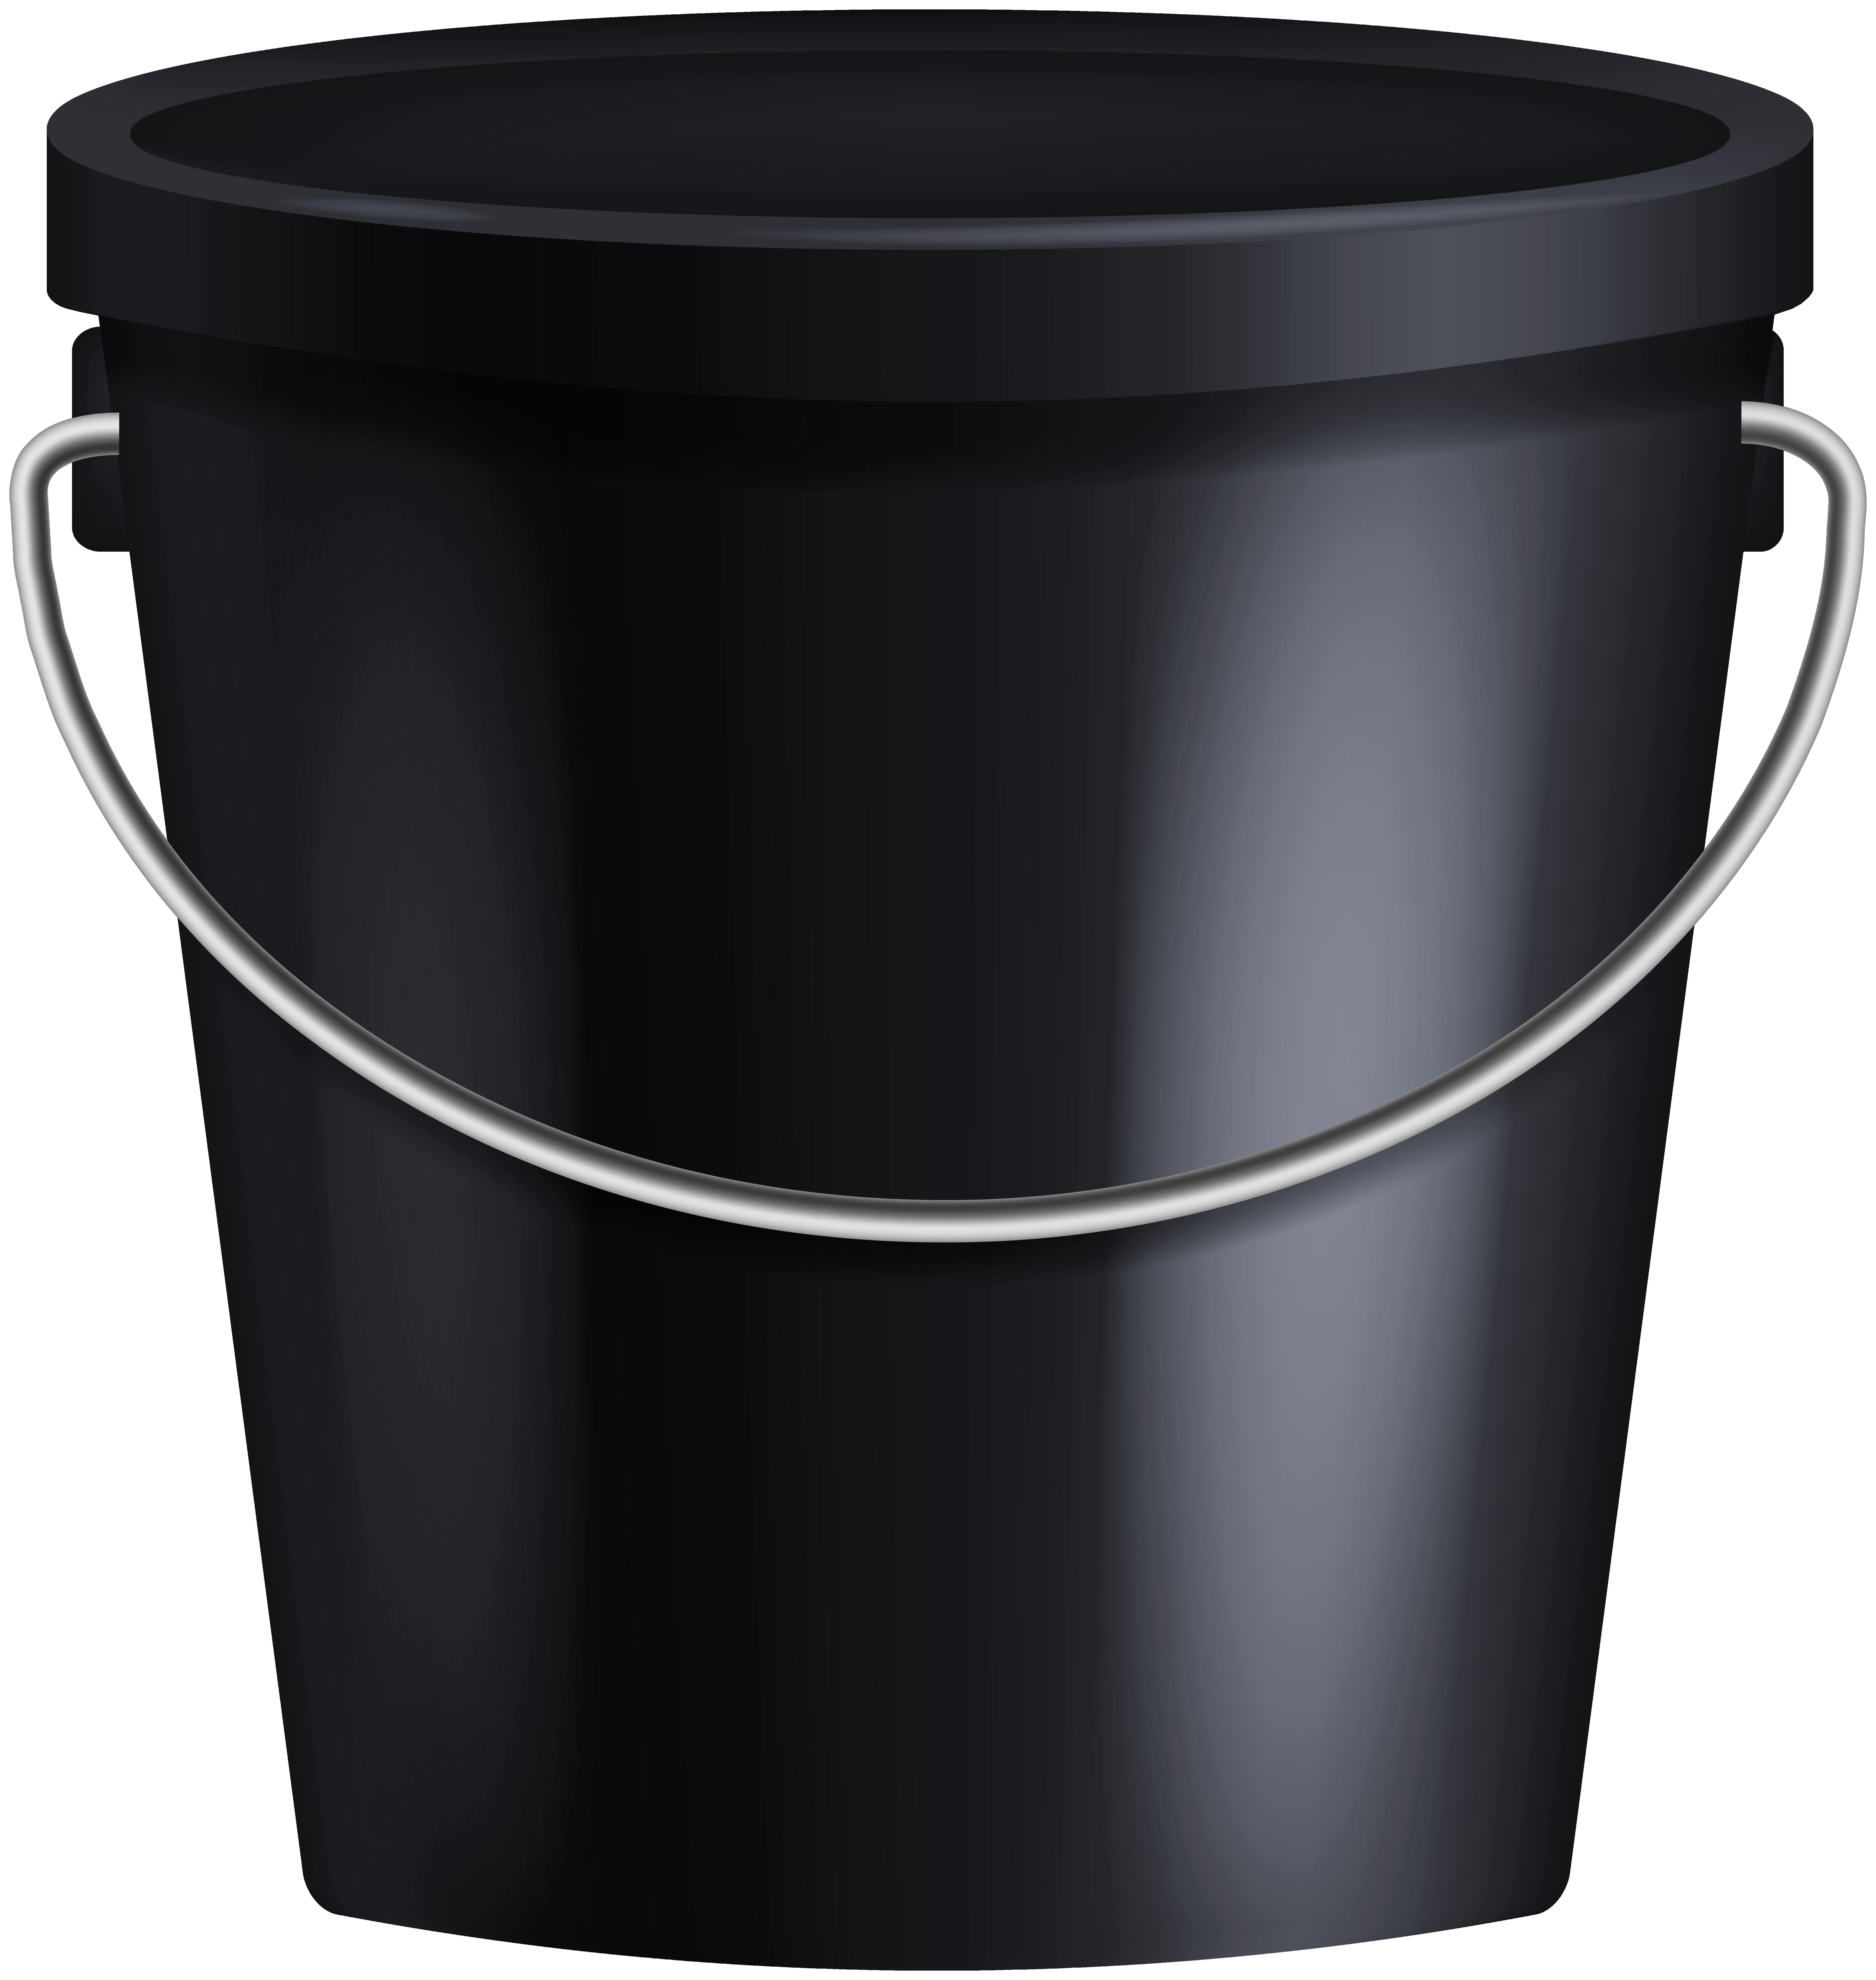 Black Bucket PNG Clipart.